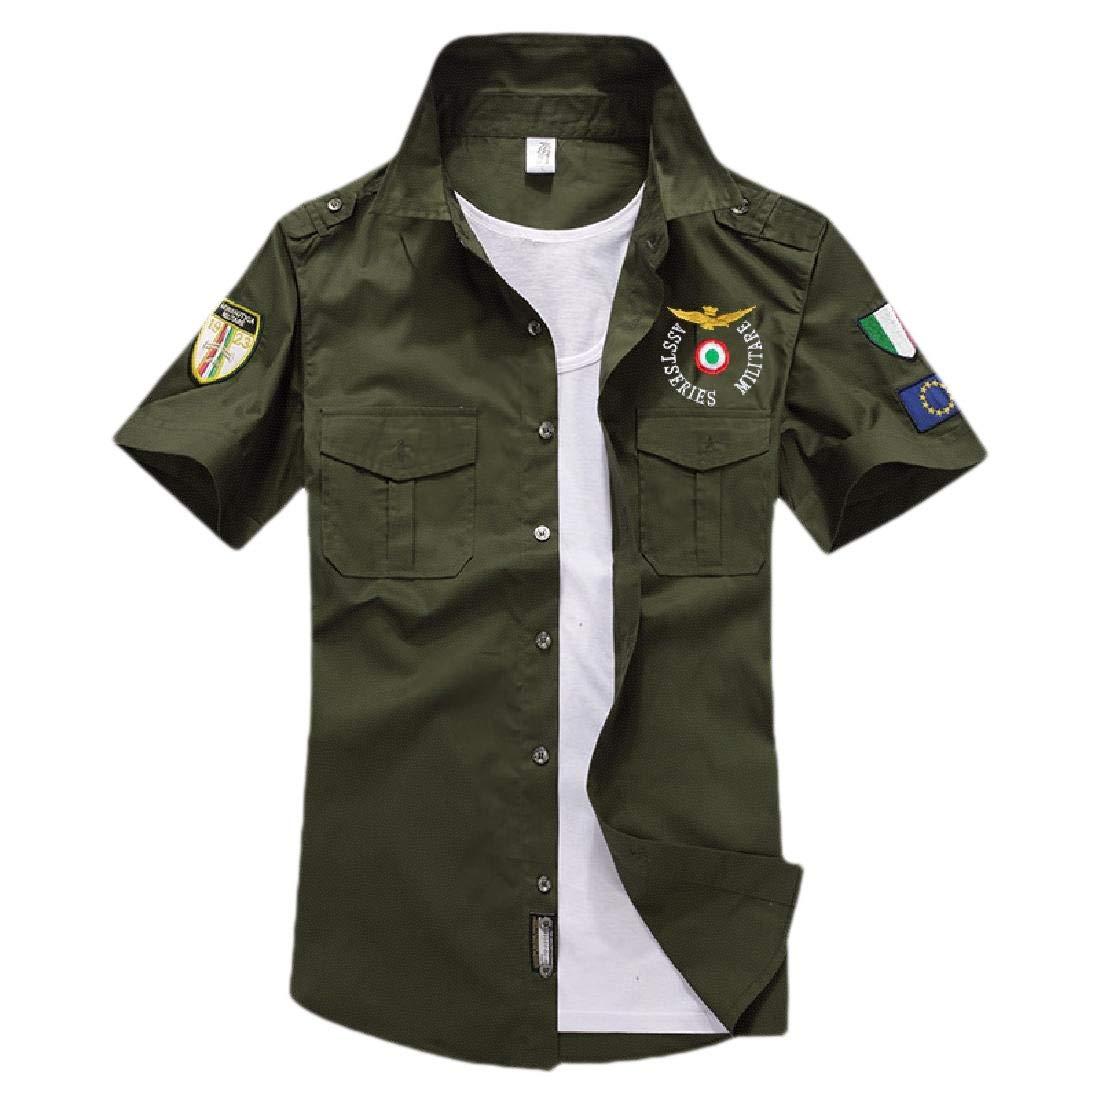 ZXFHZS Men Short Sleeve Military Style Tops Tactical Cargo Work Shirt